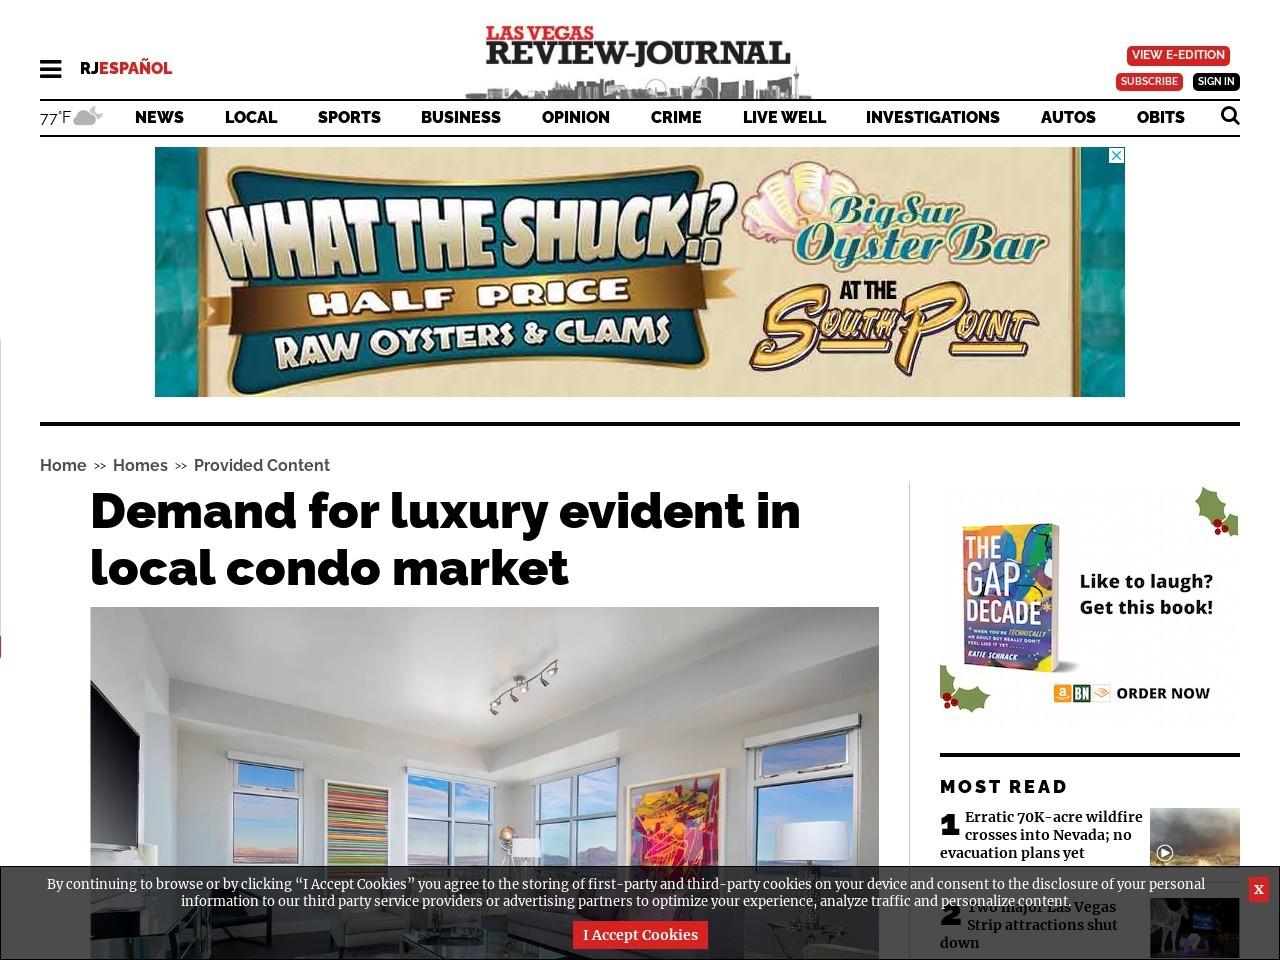 Demand for luxury evident in local condo market